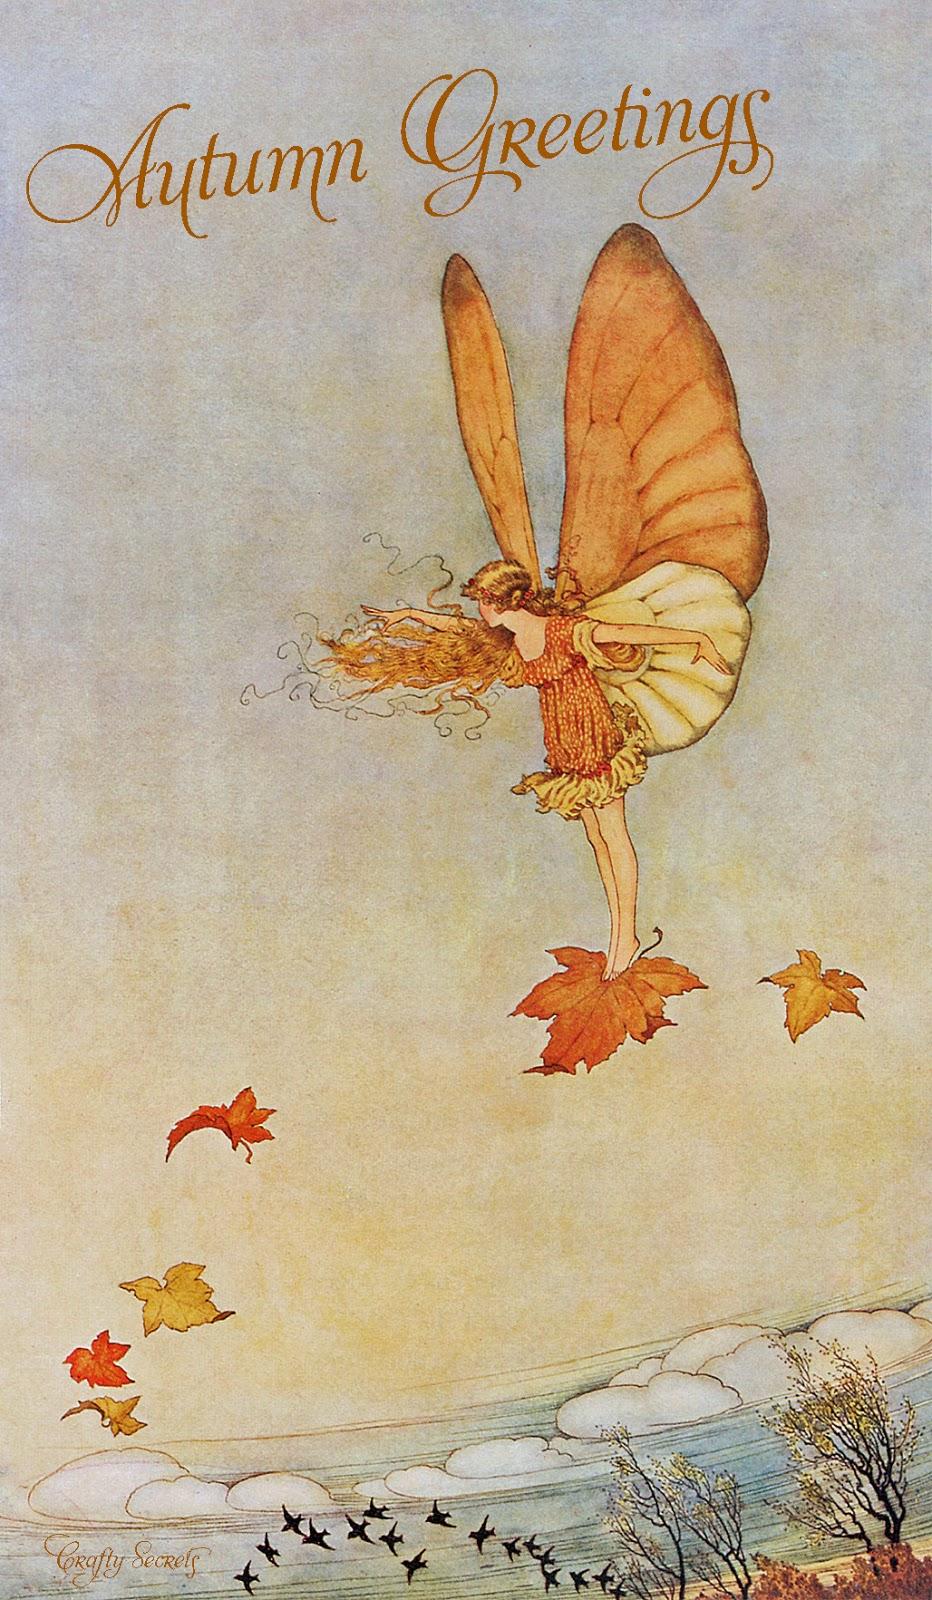 http://4.bp.blogspot.com/-8cVIEEvhuxM/VDw9PvlgOLI/AAAAAAAASDU/h1tjtLenRWA/s1600/autumn_greetings_fairy-craftysecrets-2014.jpg